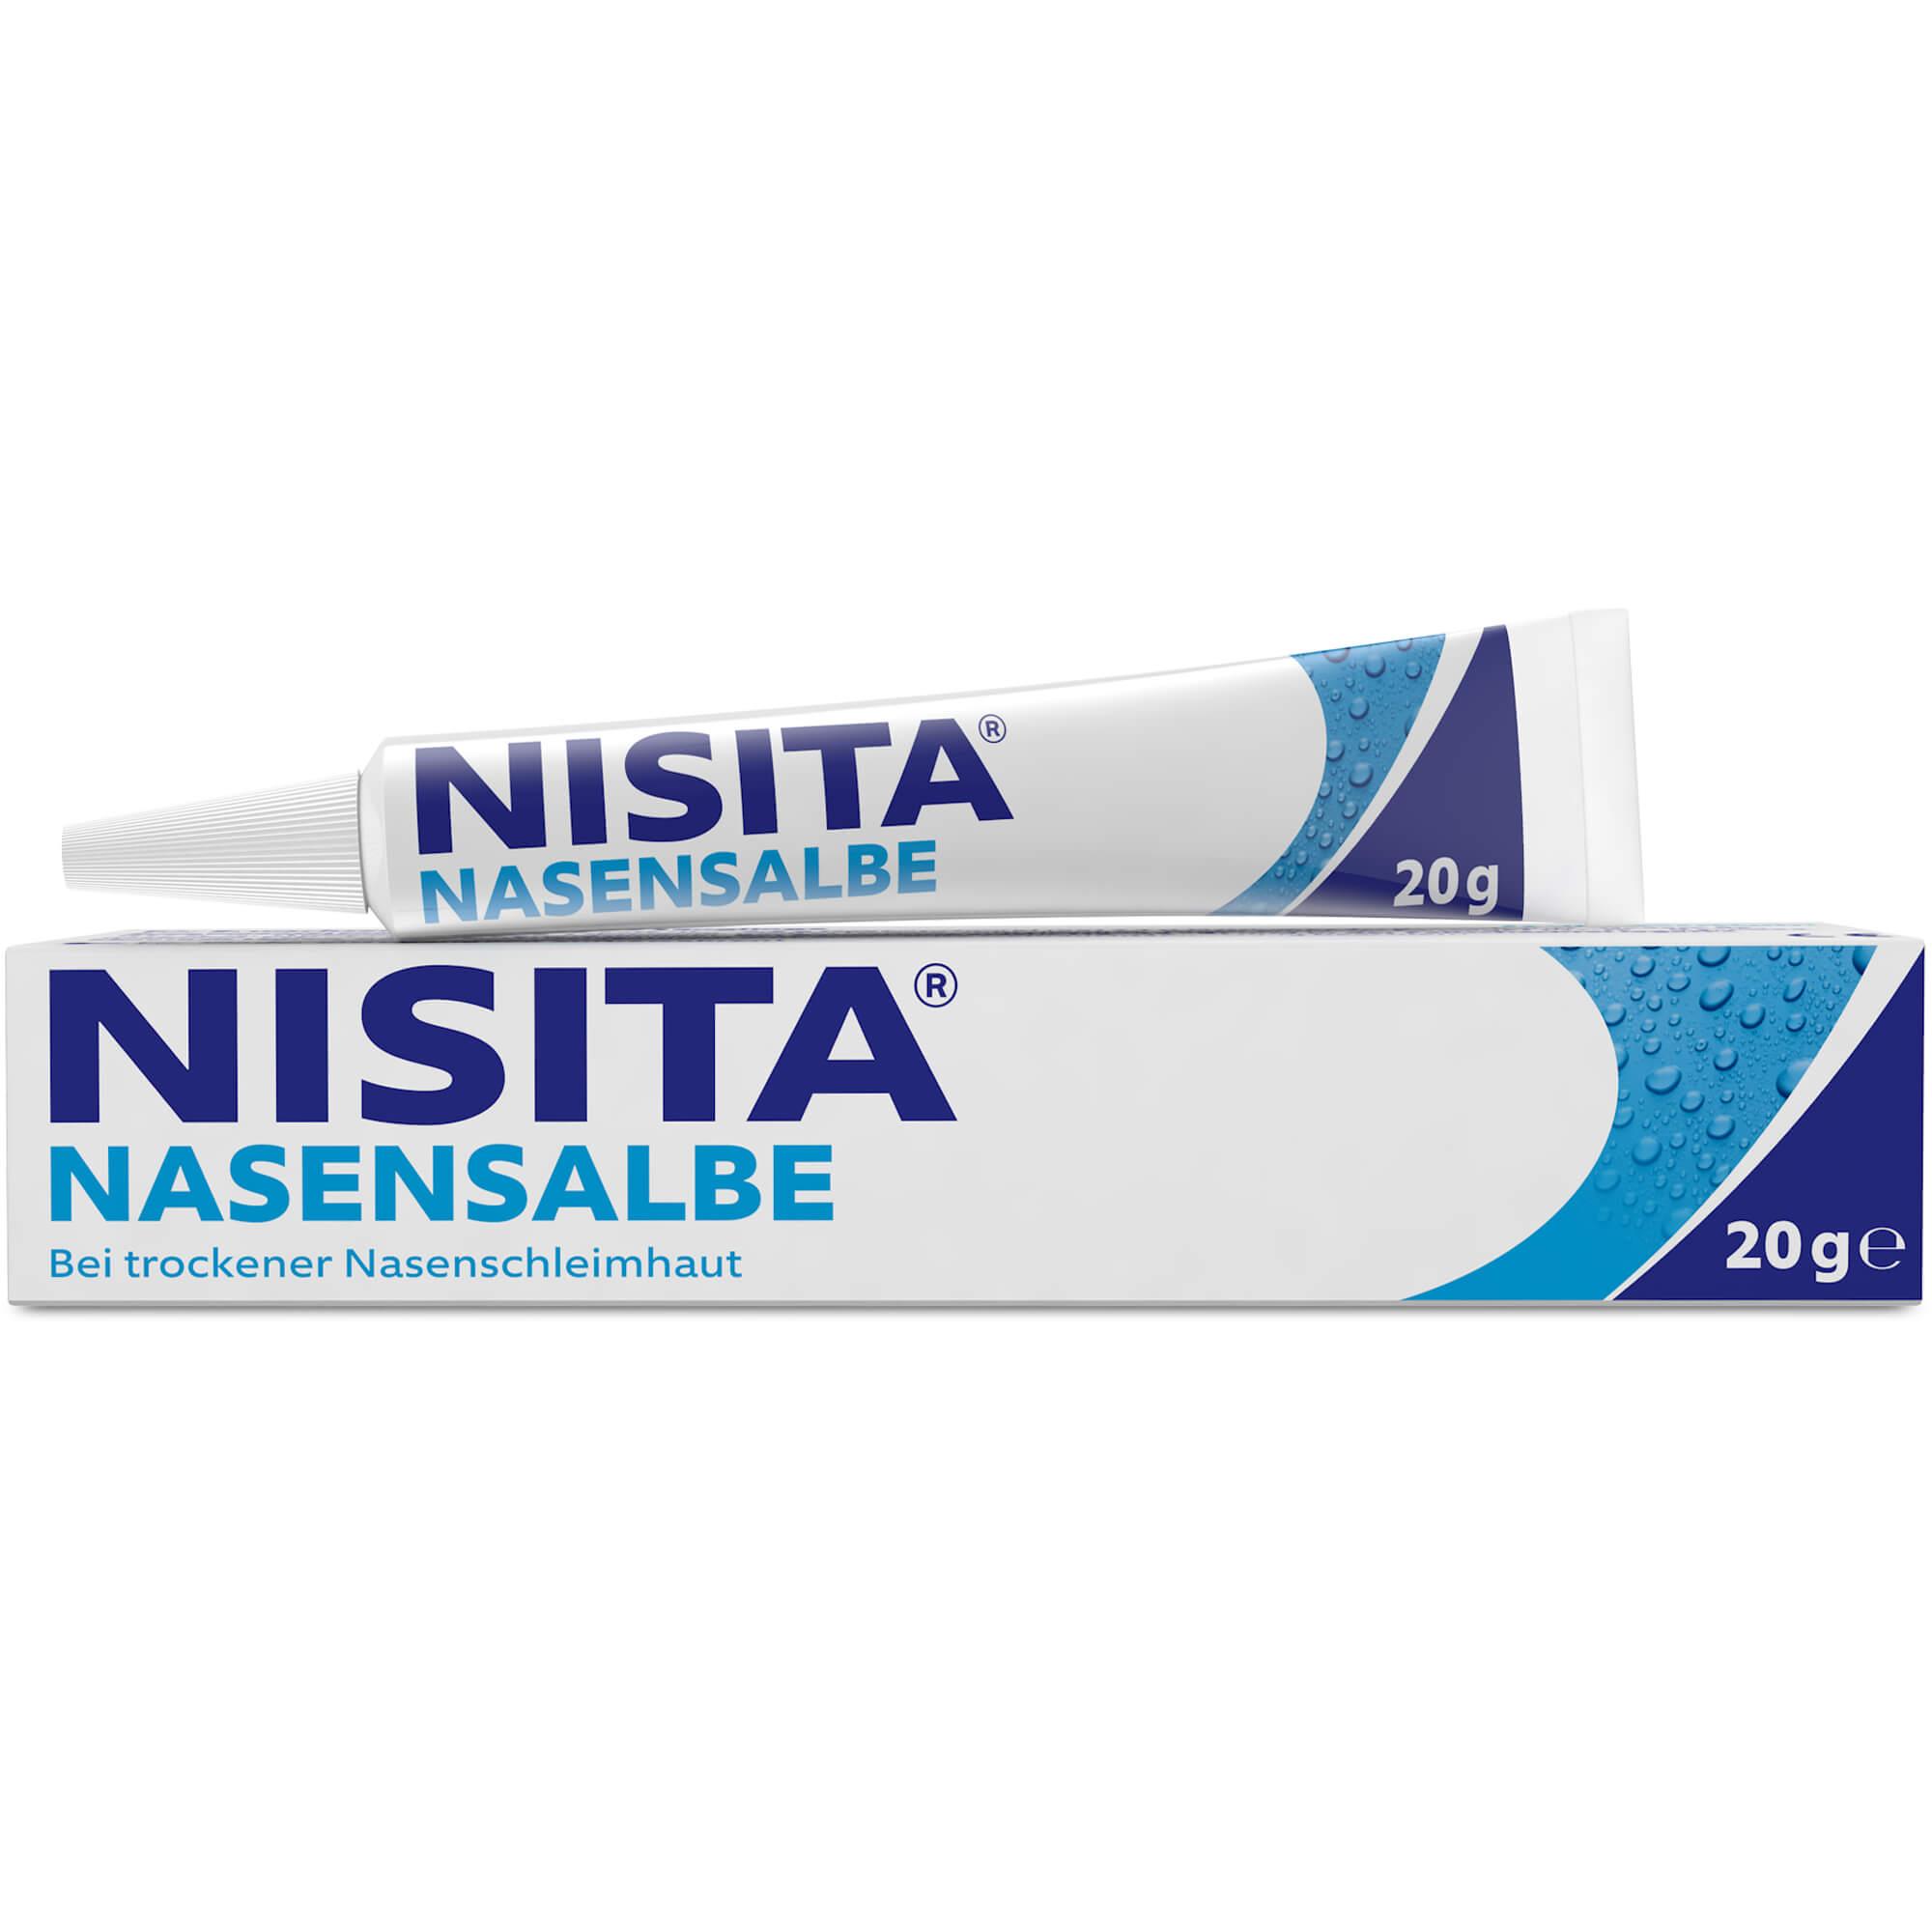 NISITA-Nasensalbe